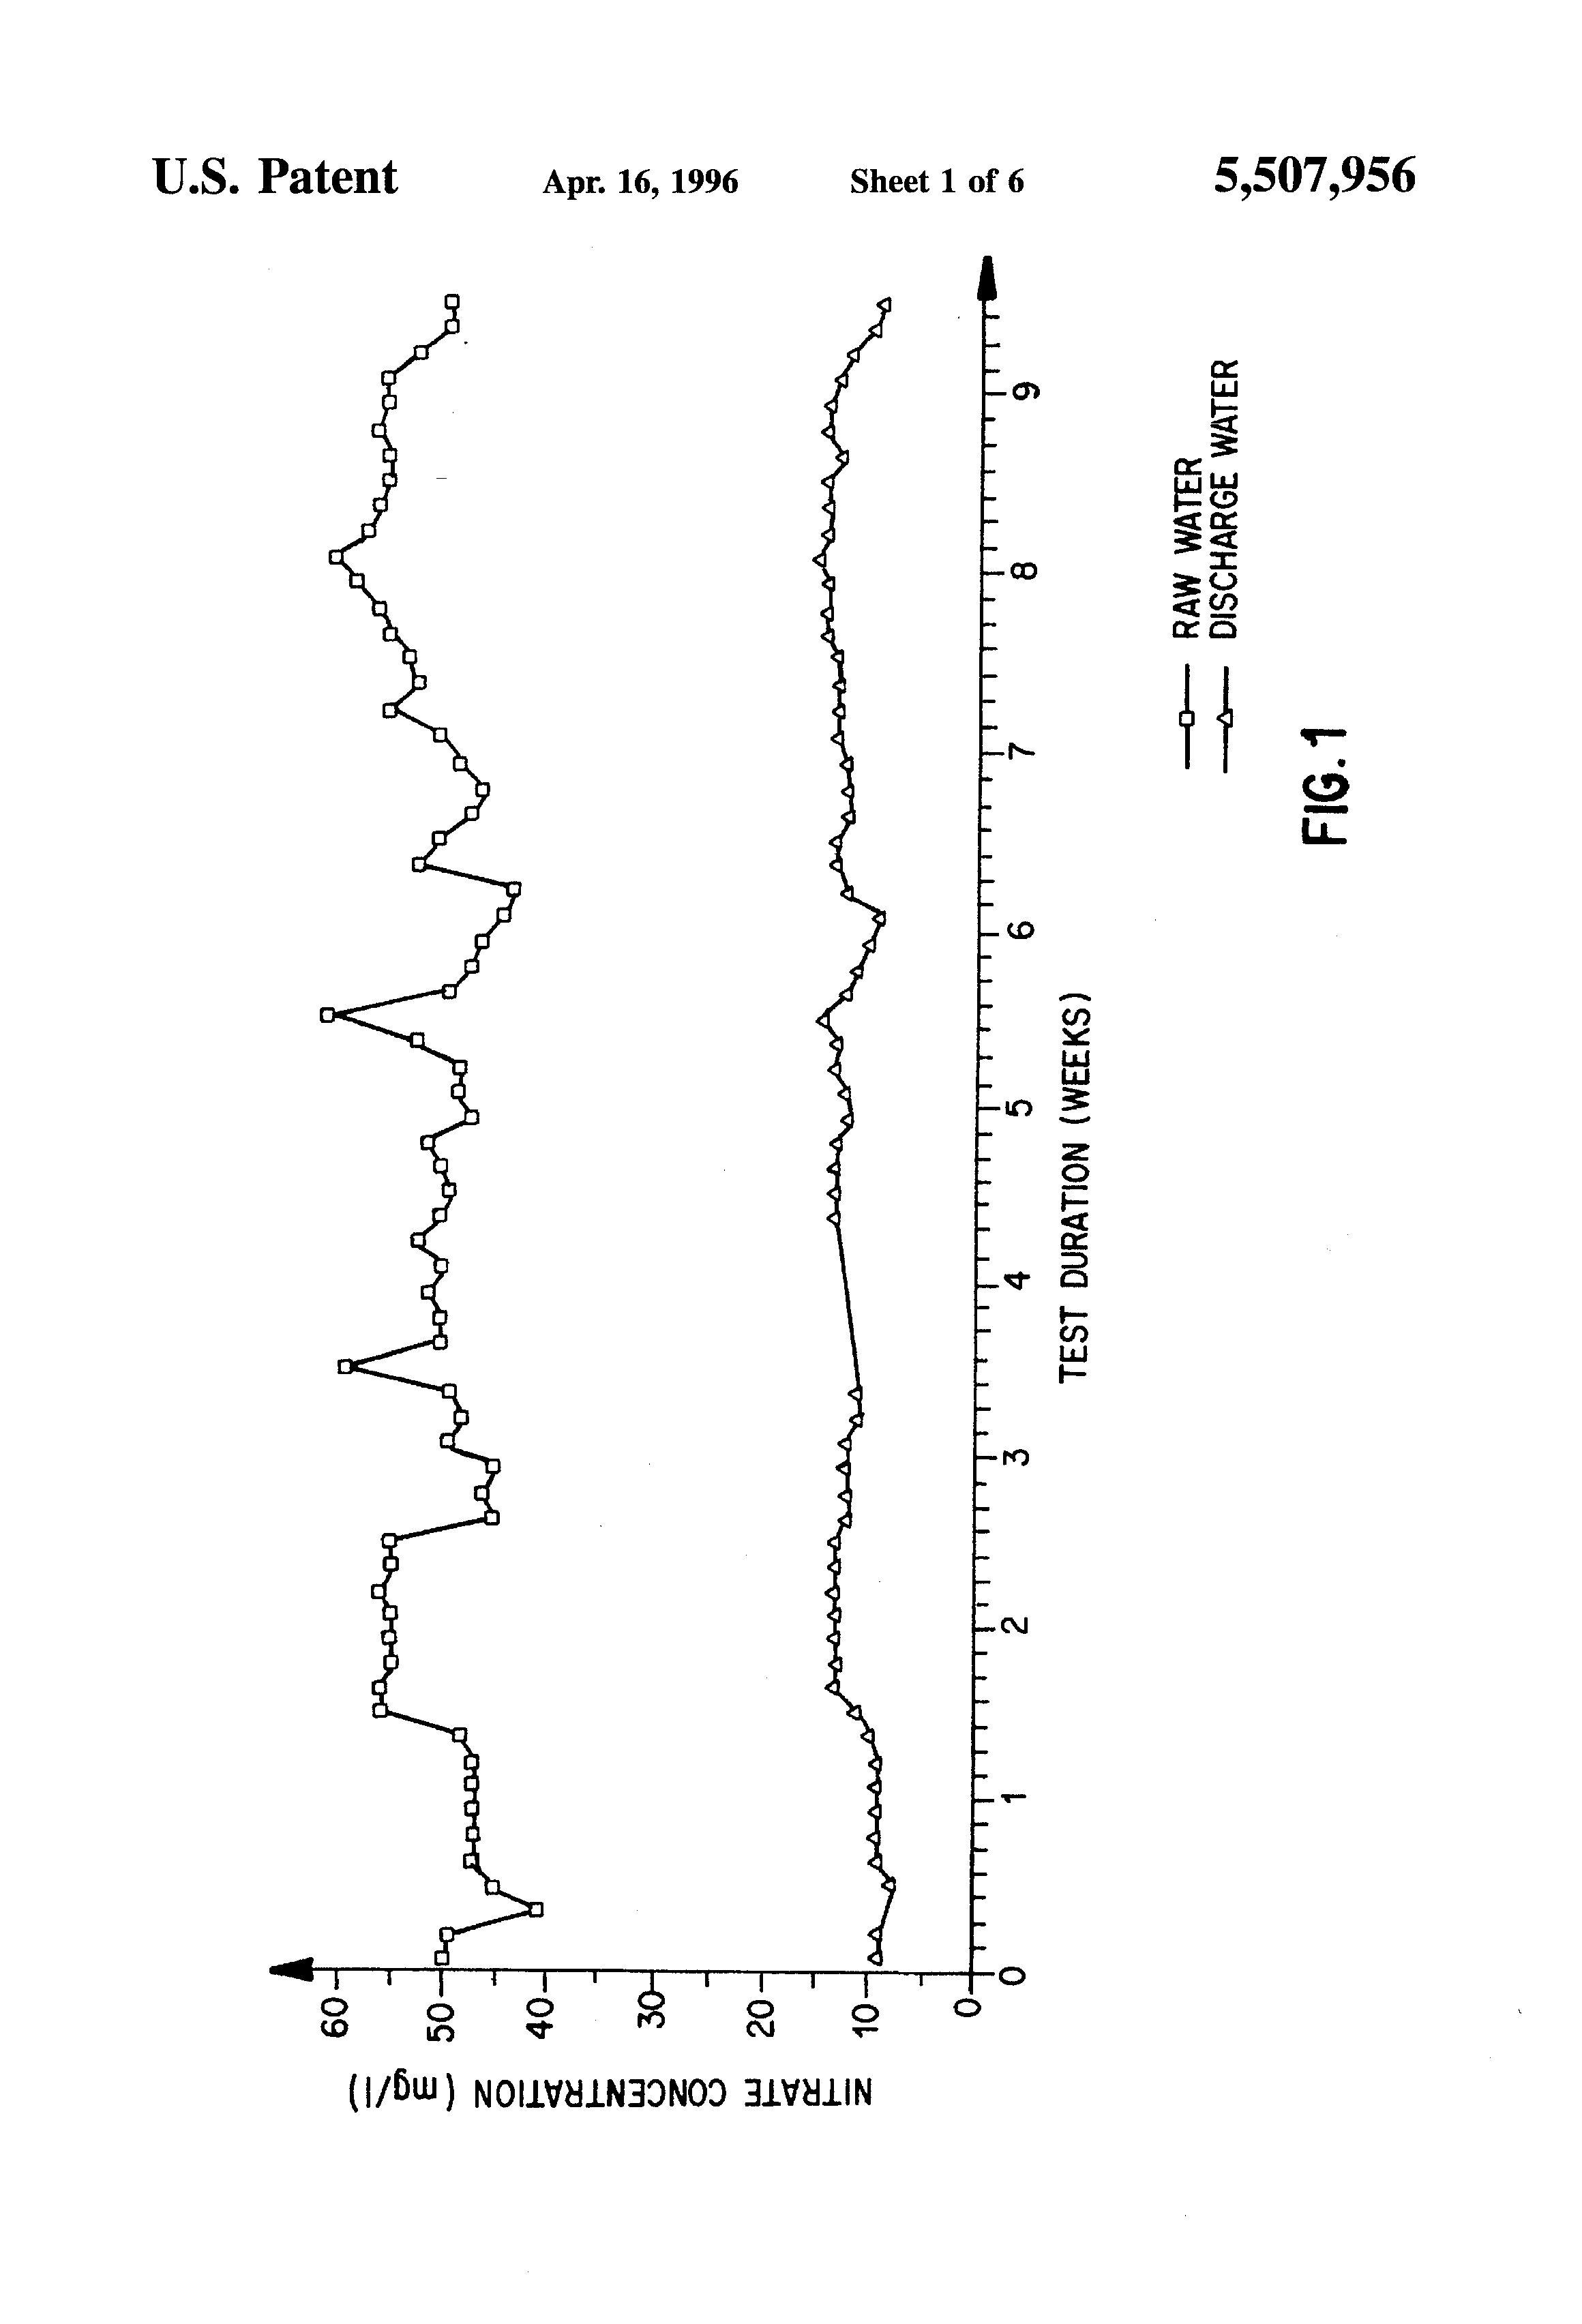 Novel Porous Rhodium Catalysts